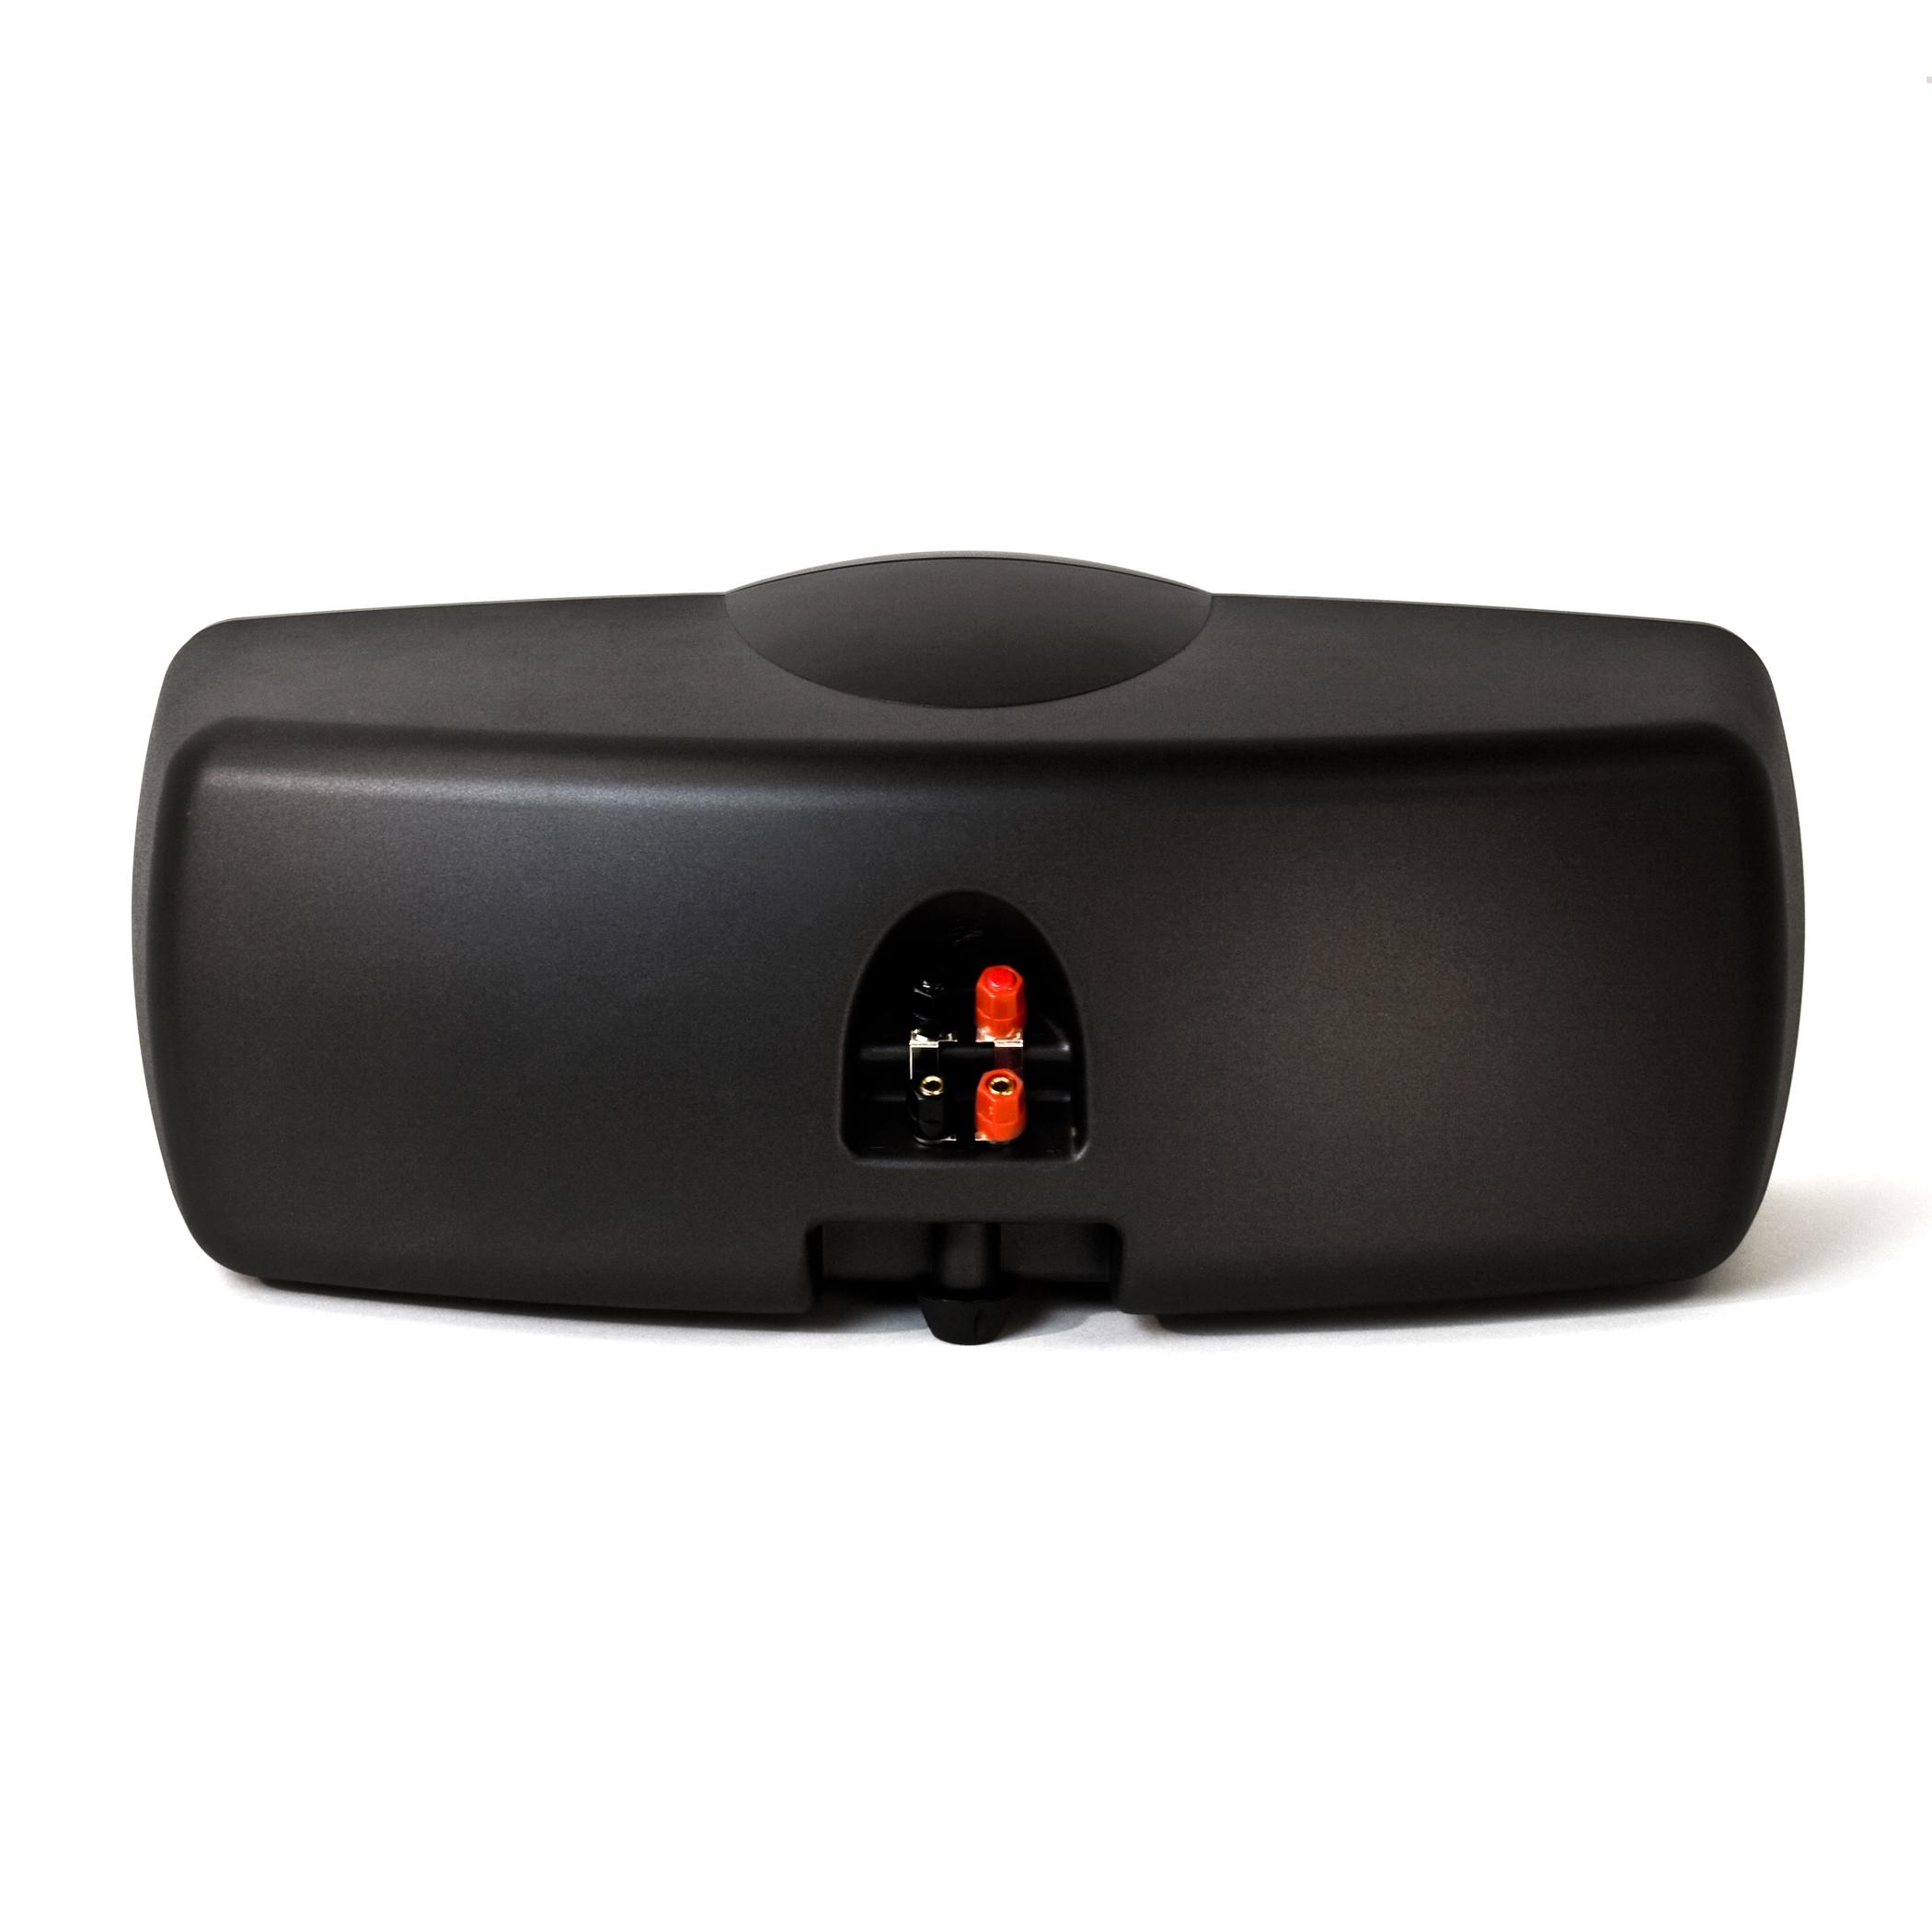 C 20 Center Speaker Klipsch Headphone Wiring Diagram Features